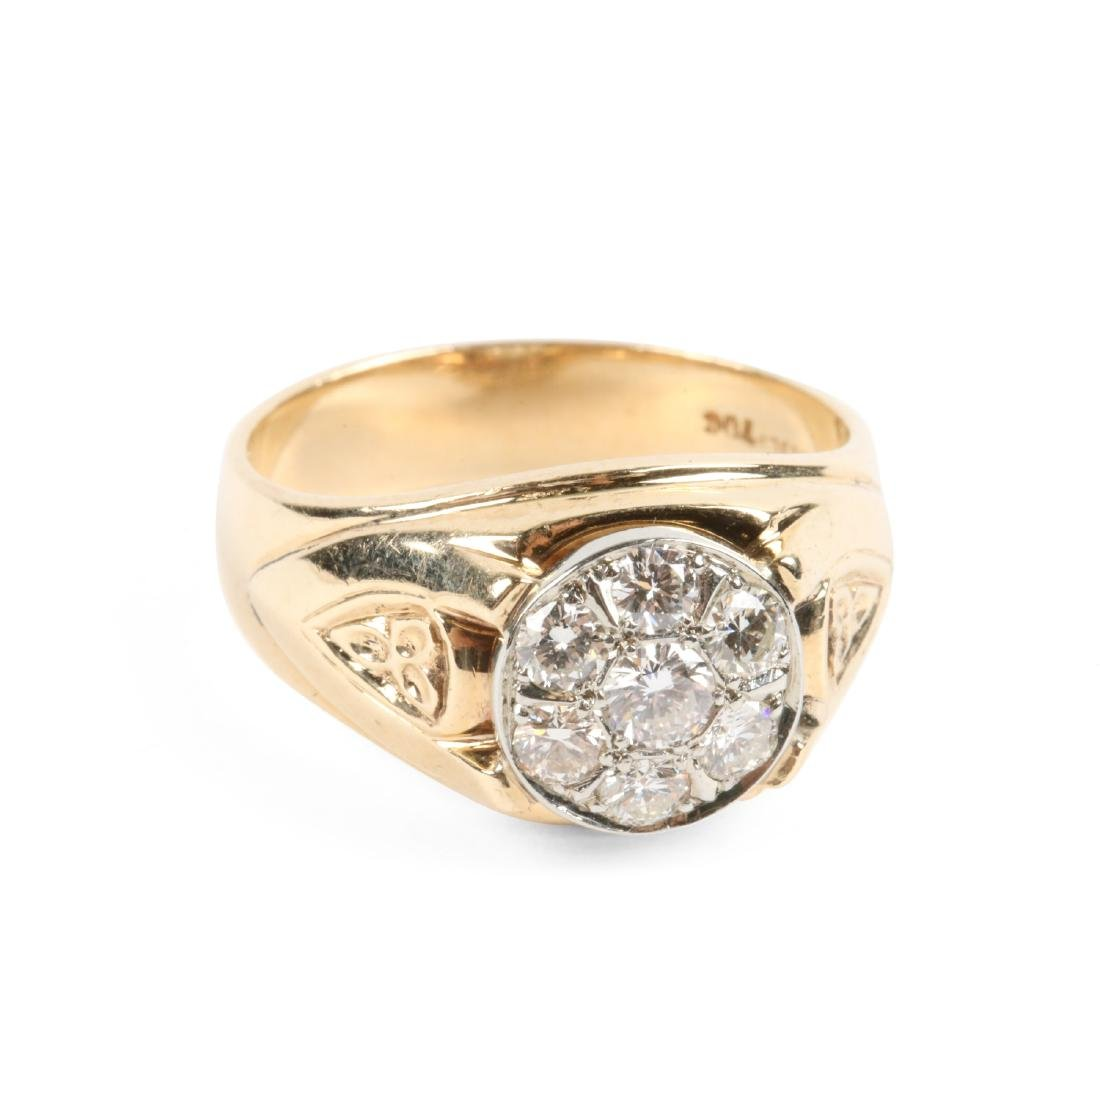 A 18K Gold & Diamond Ring